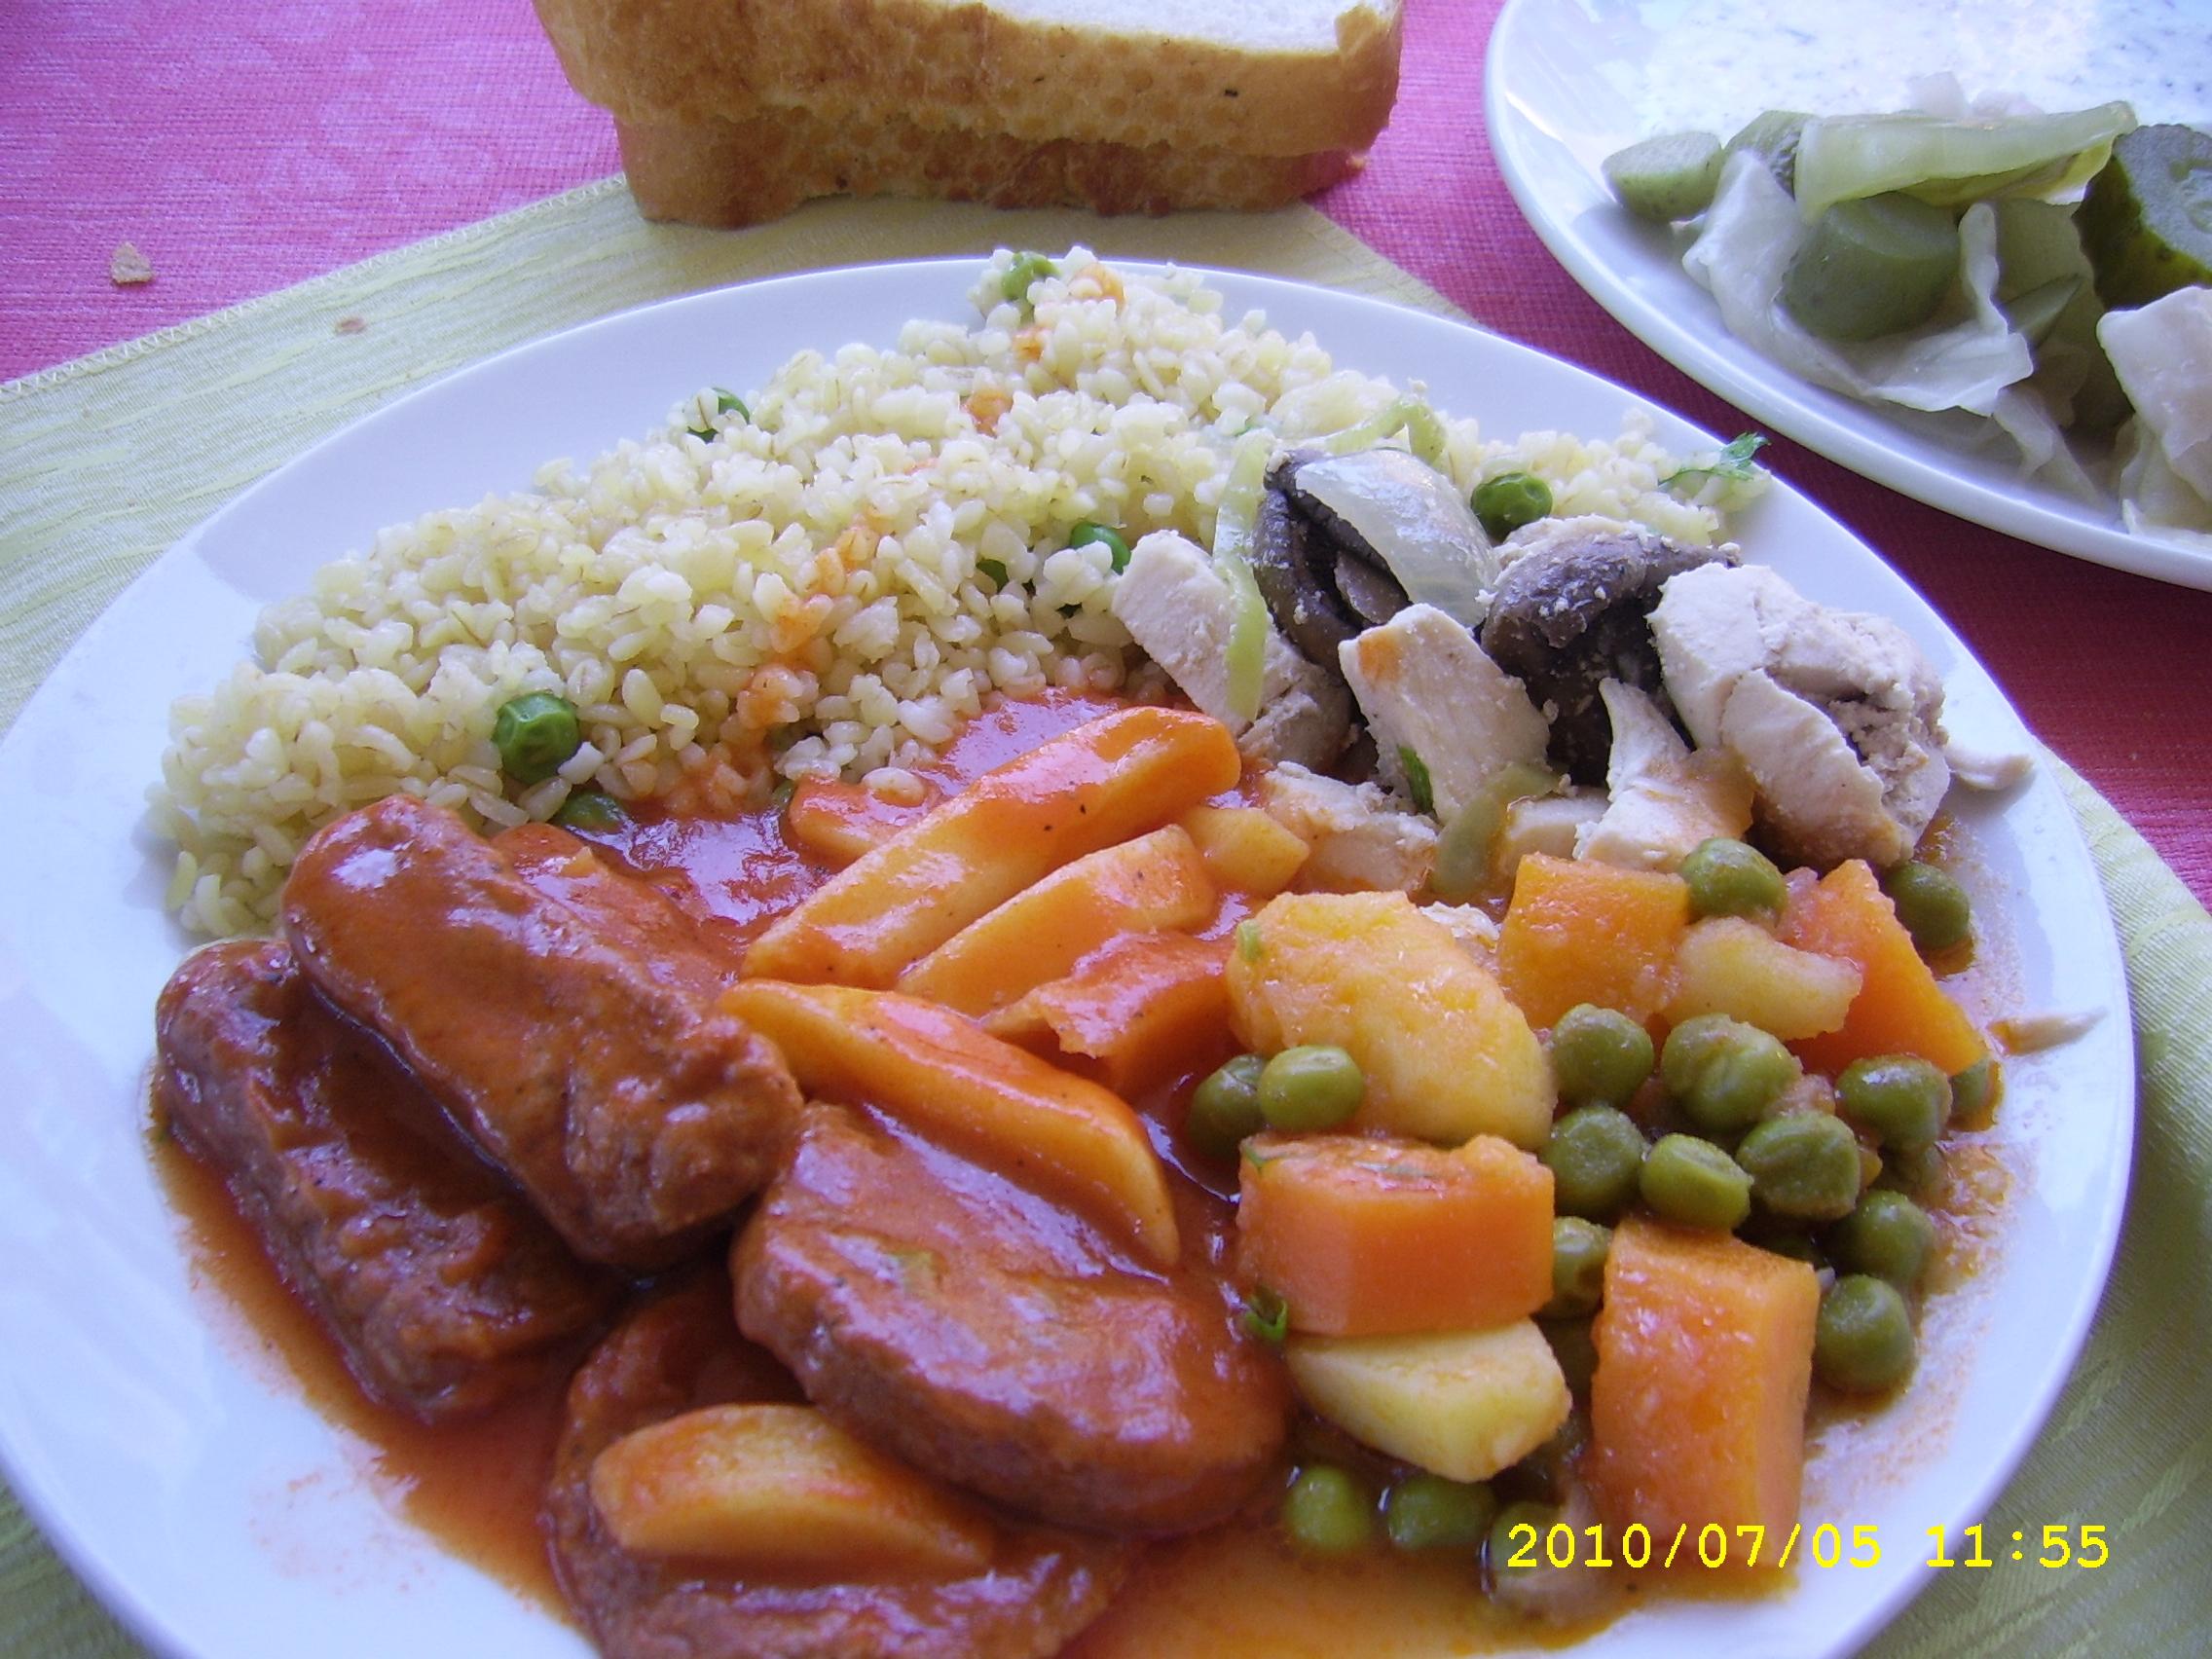 https://foodloader.net/glKz_2010-08-25_lunch1.jpg